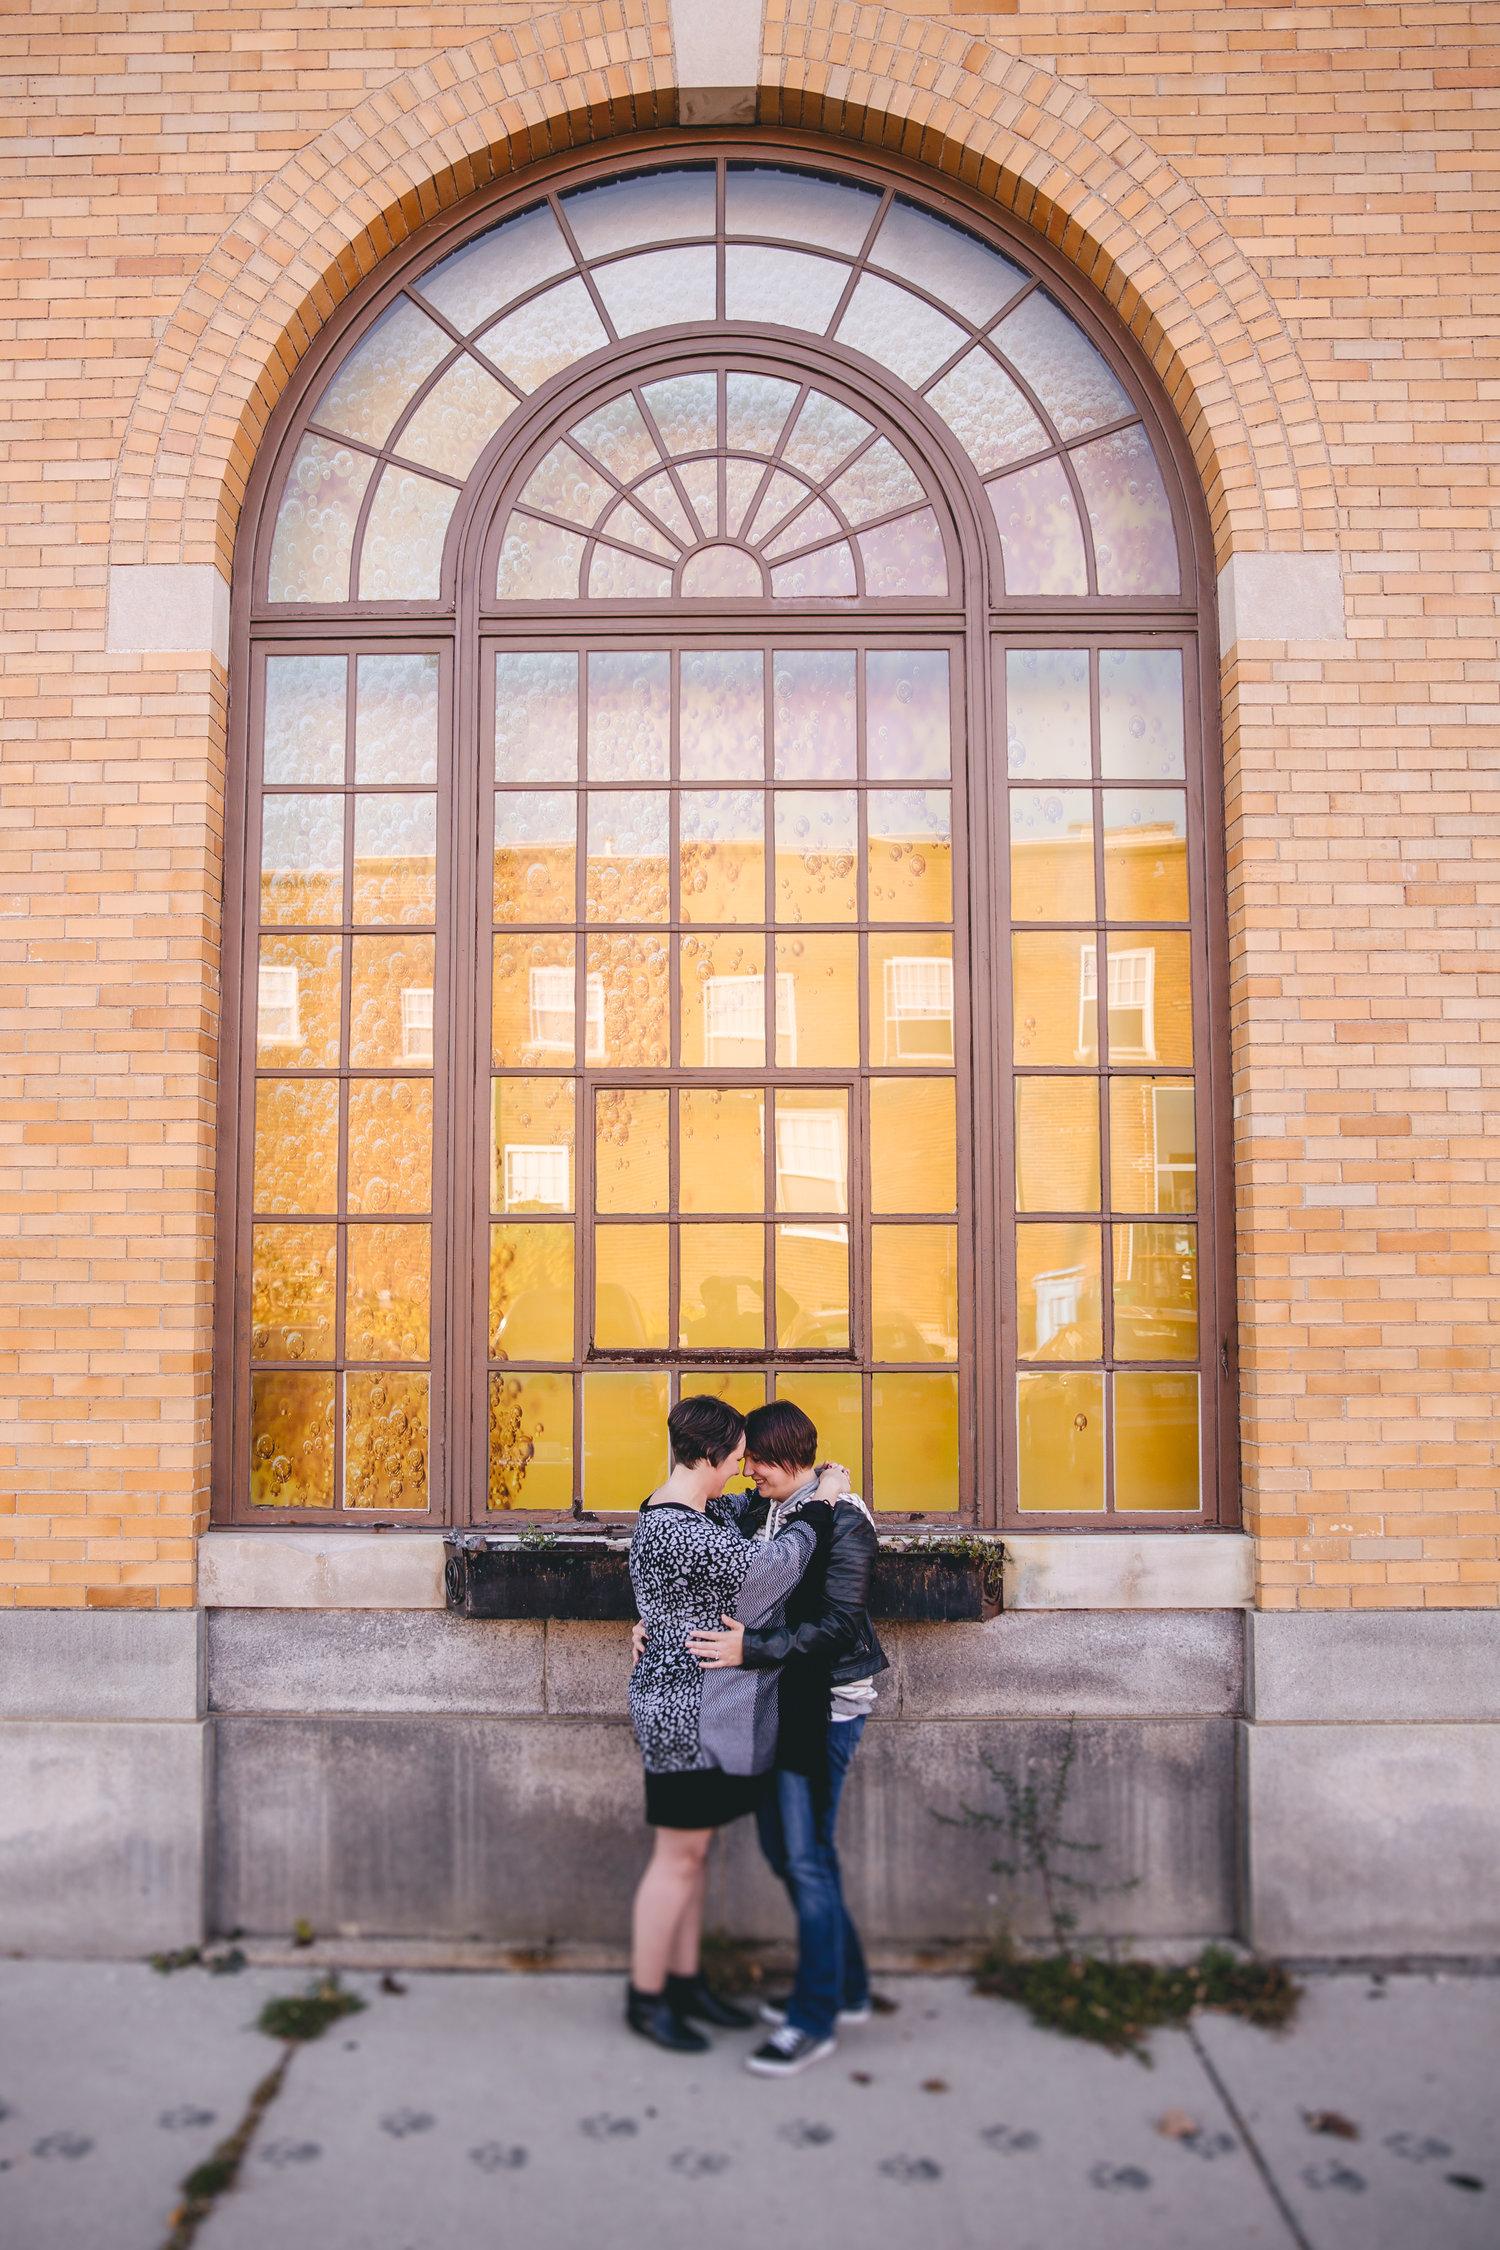 melissa + danielle | engagement | michigan state university